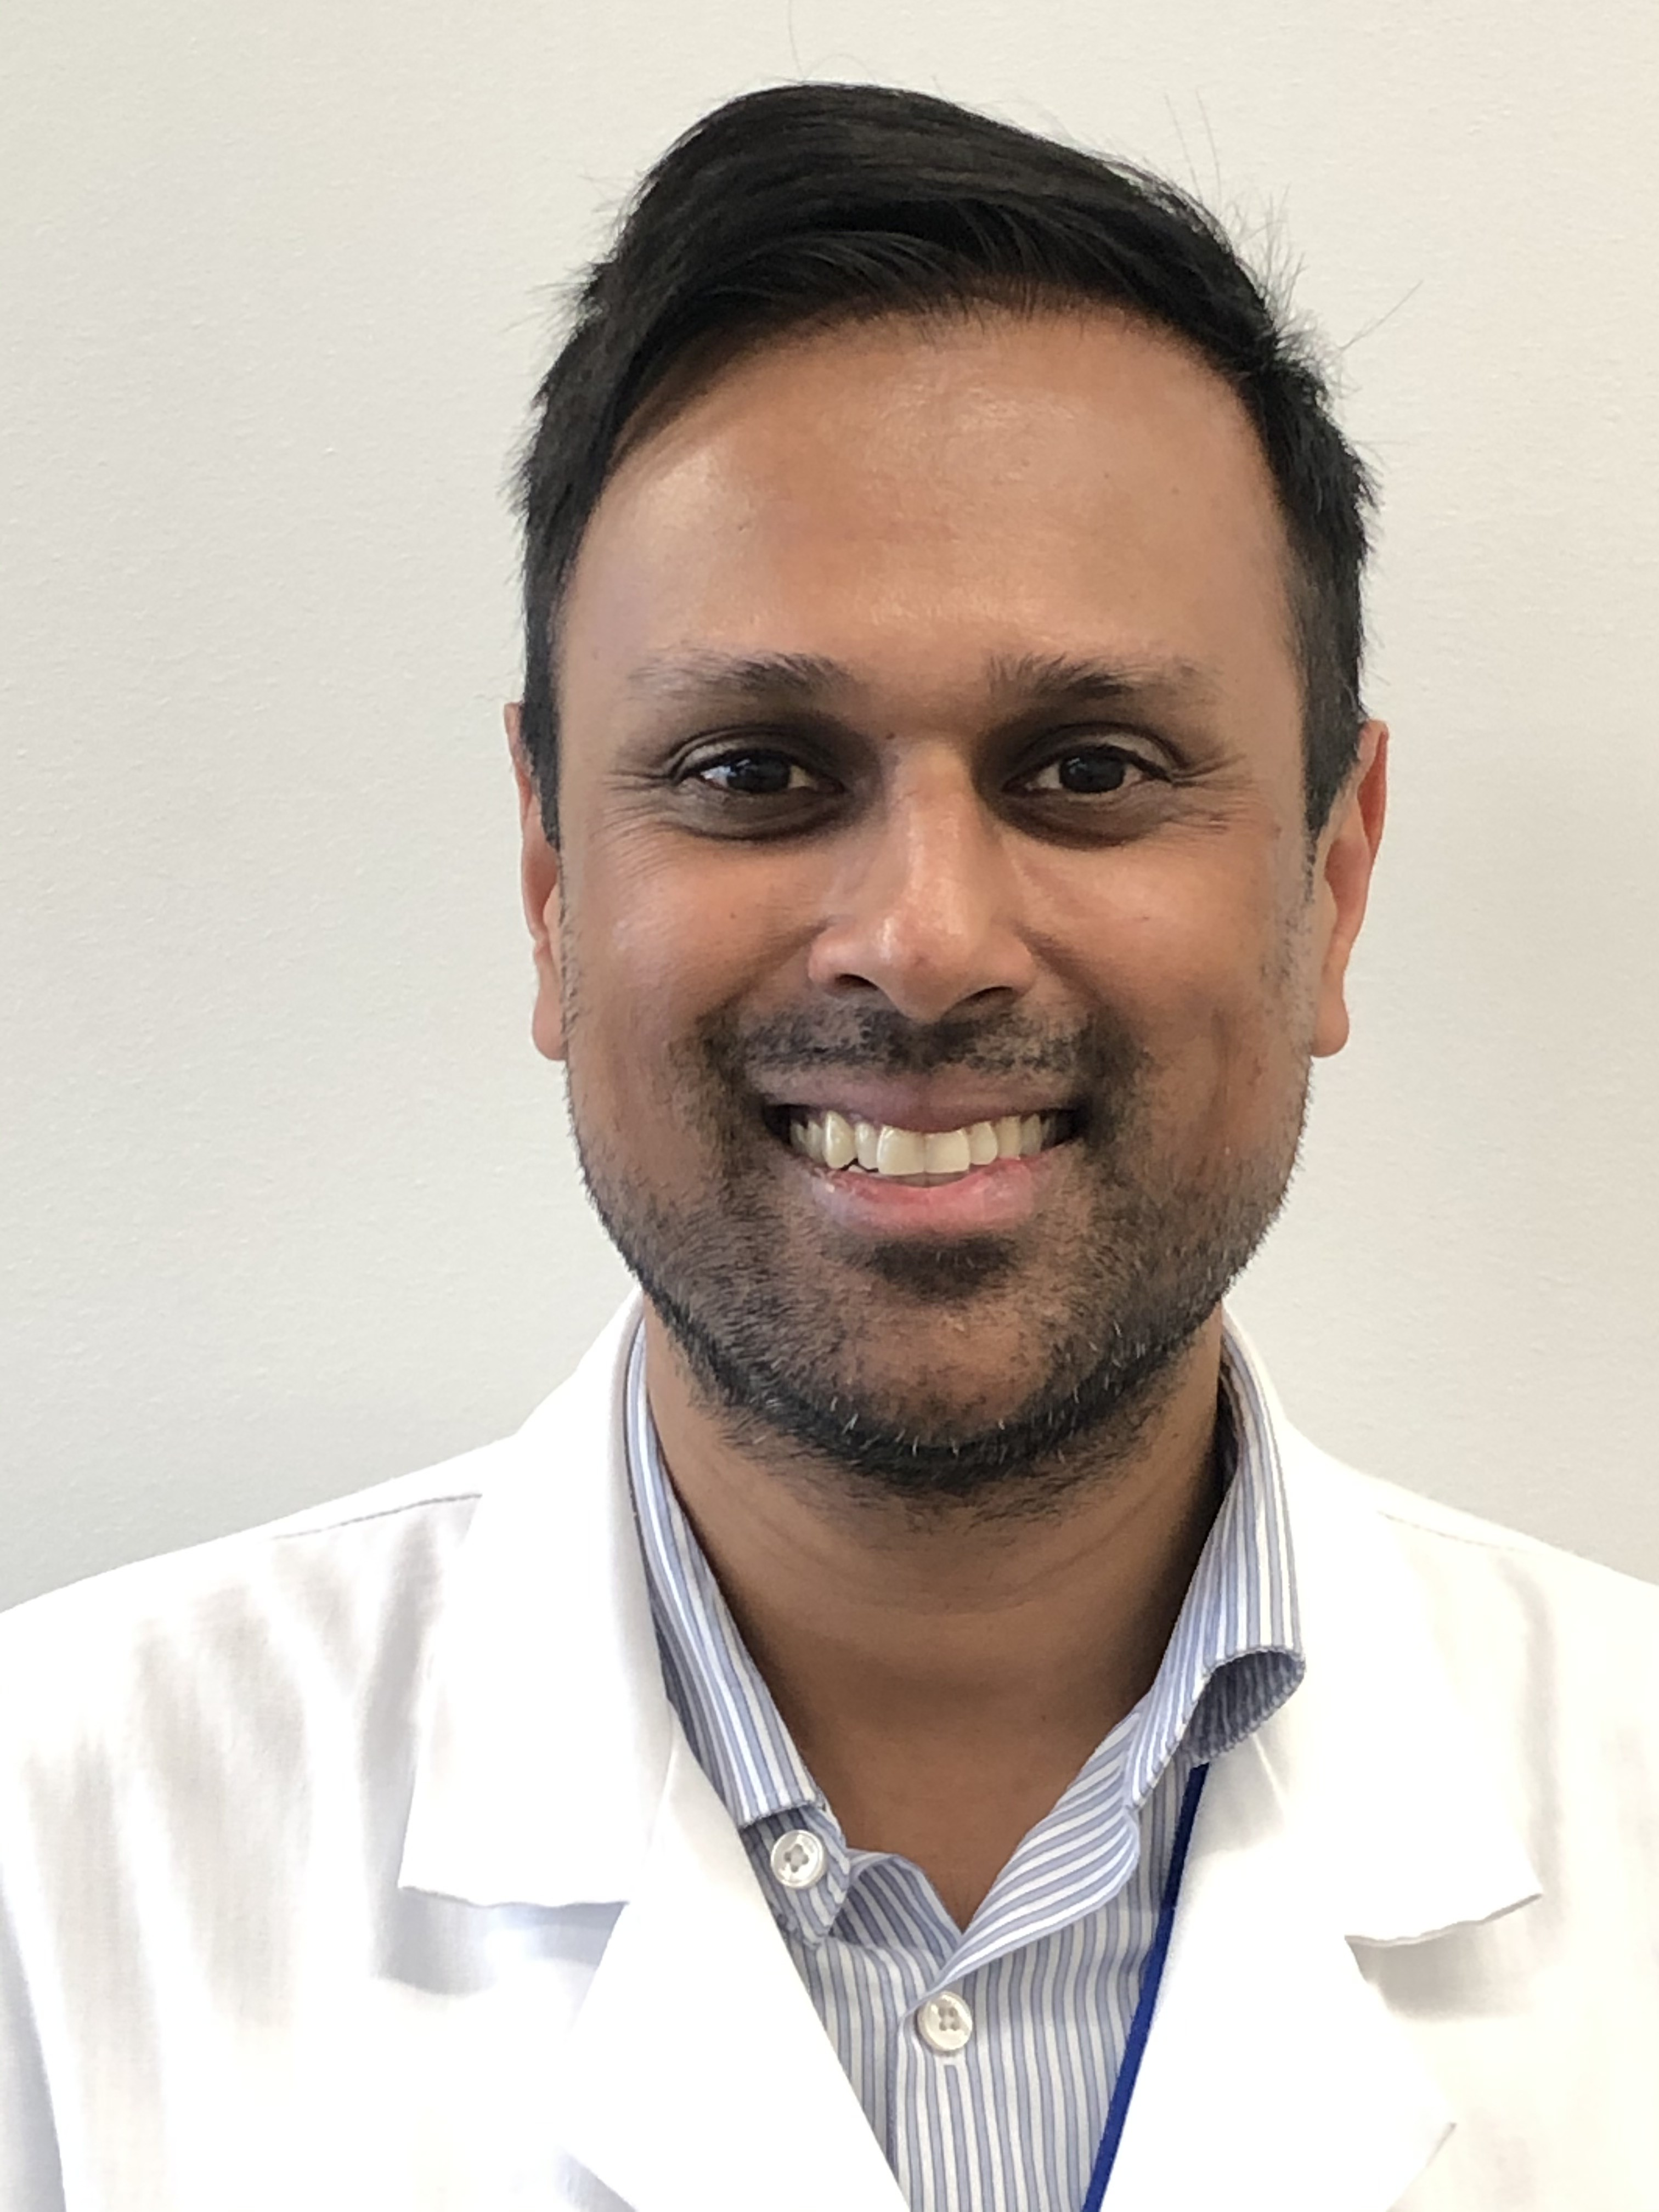 Jayshil Patel 2019 Headshot